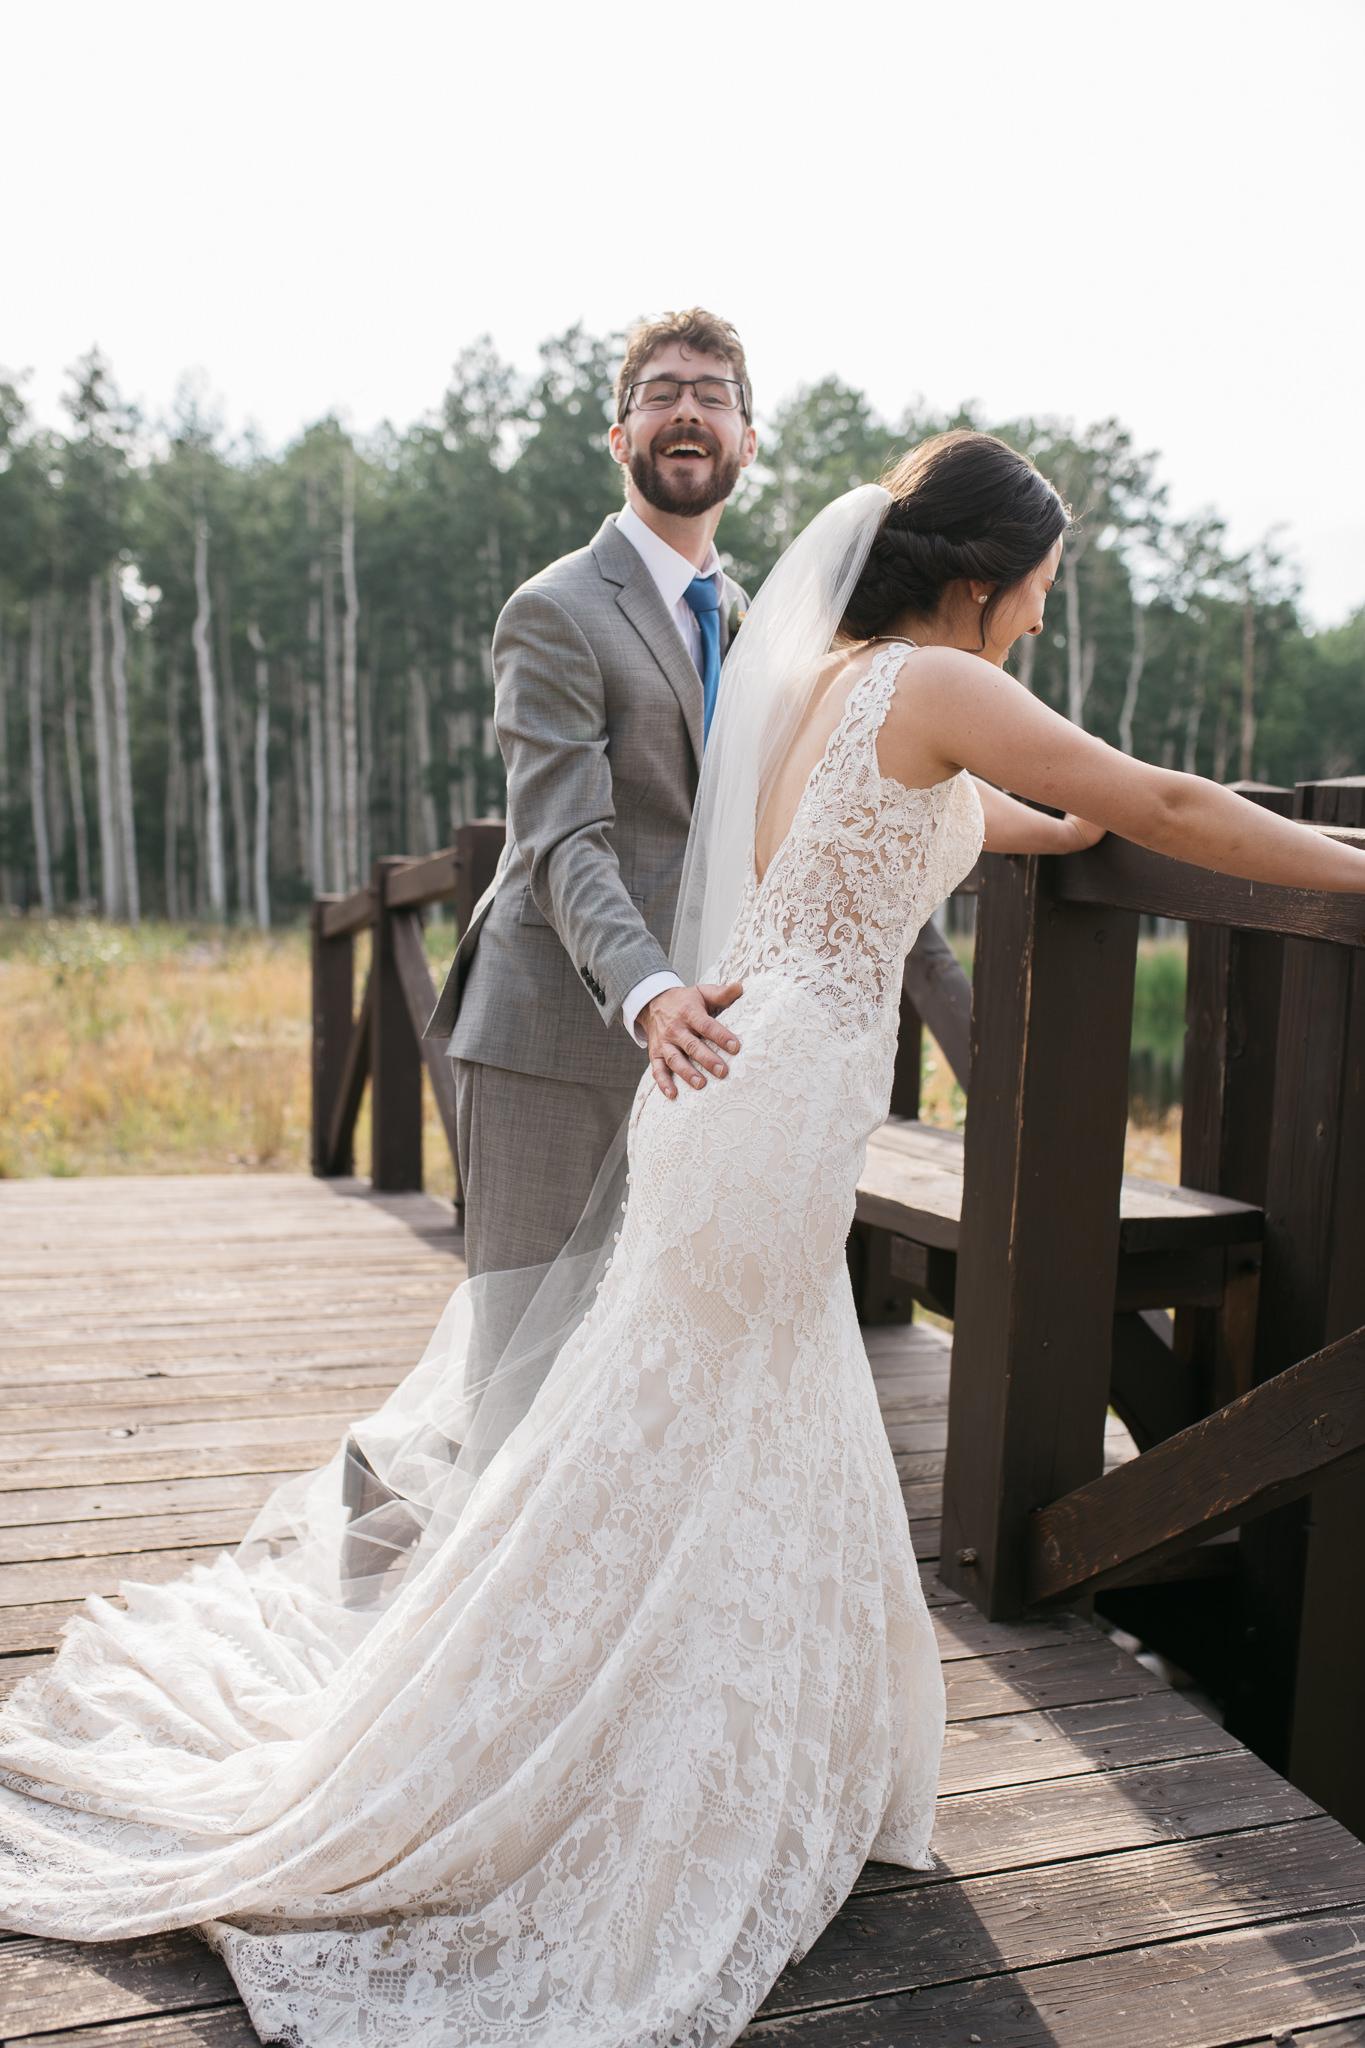 379_ONL_Kat_Nick_Wedding_Trevor_Hooper_Photo.jpg